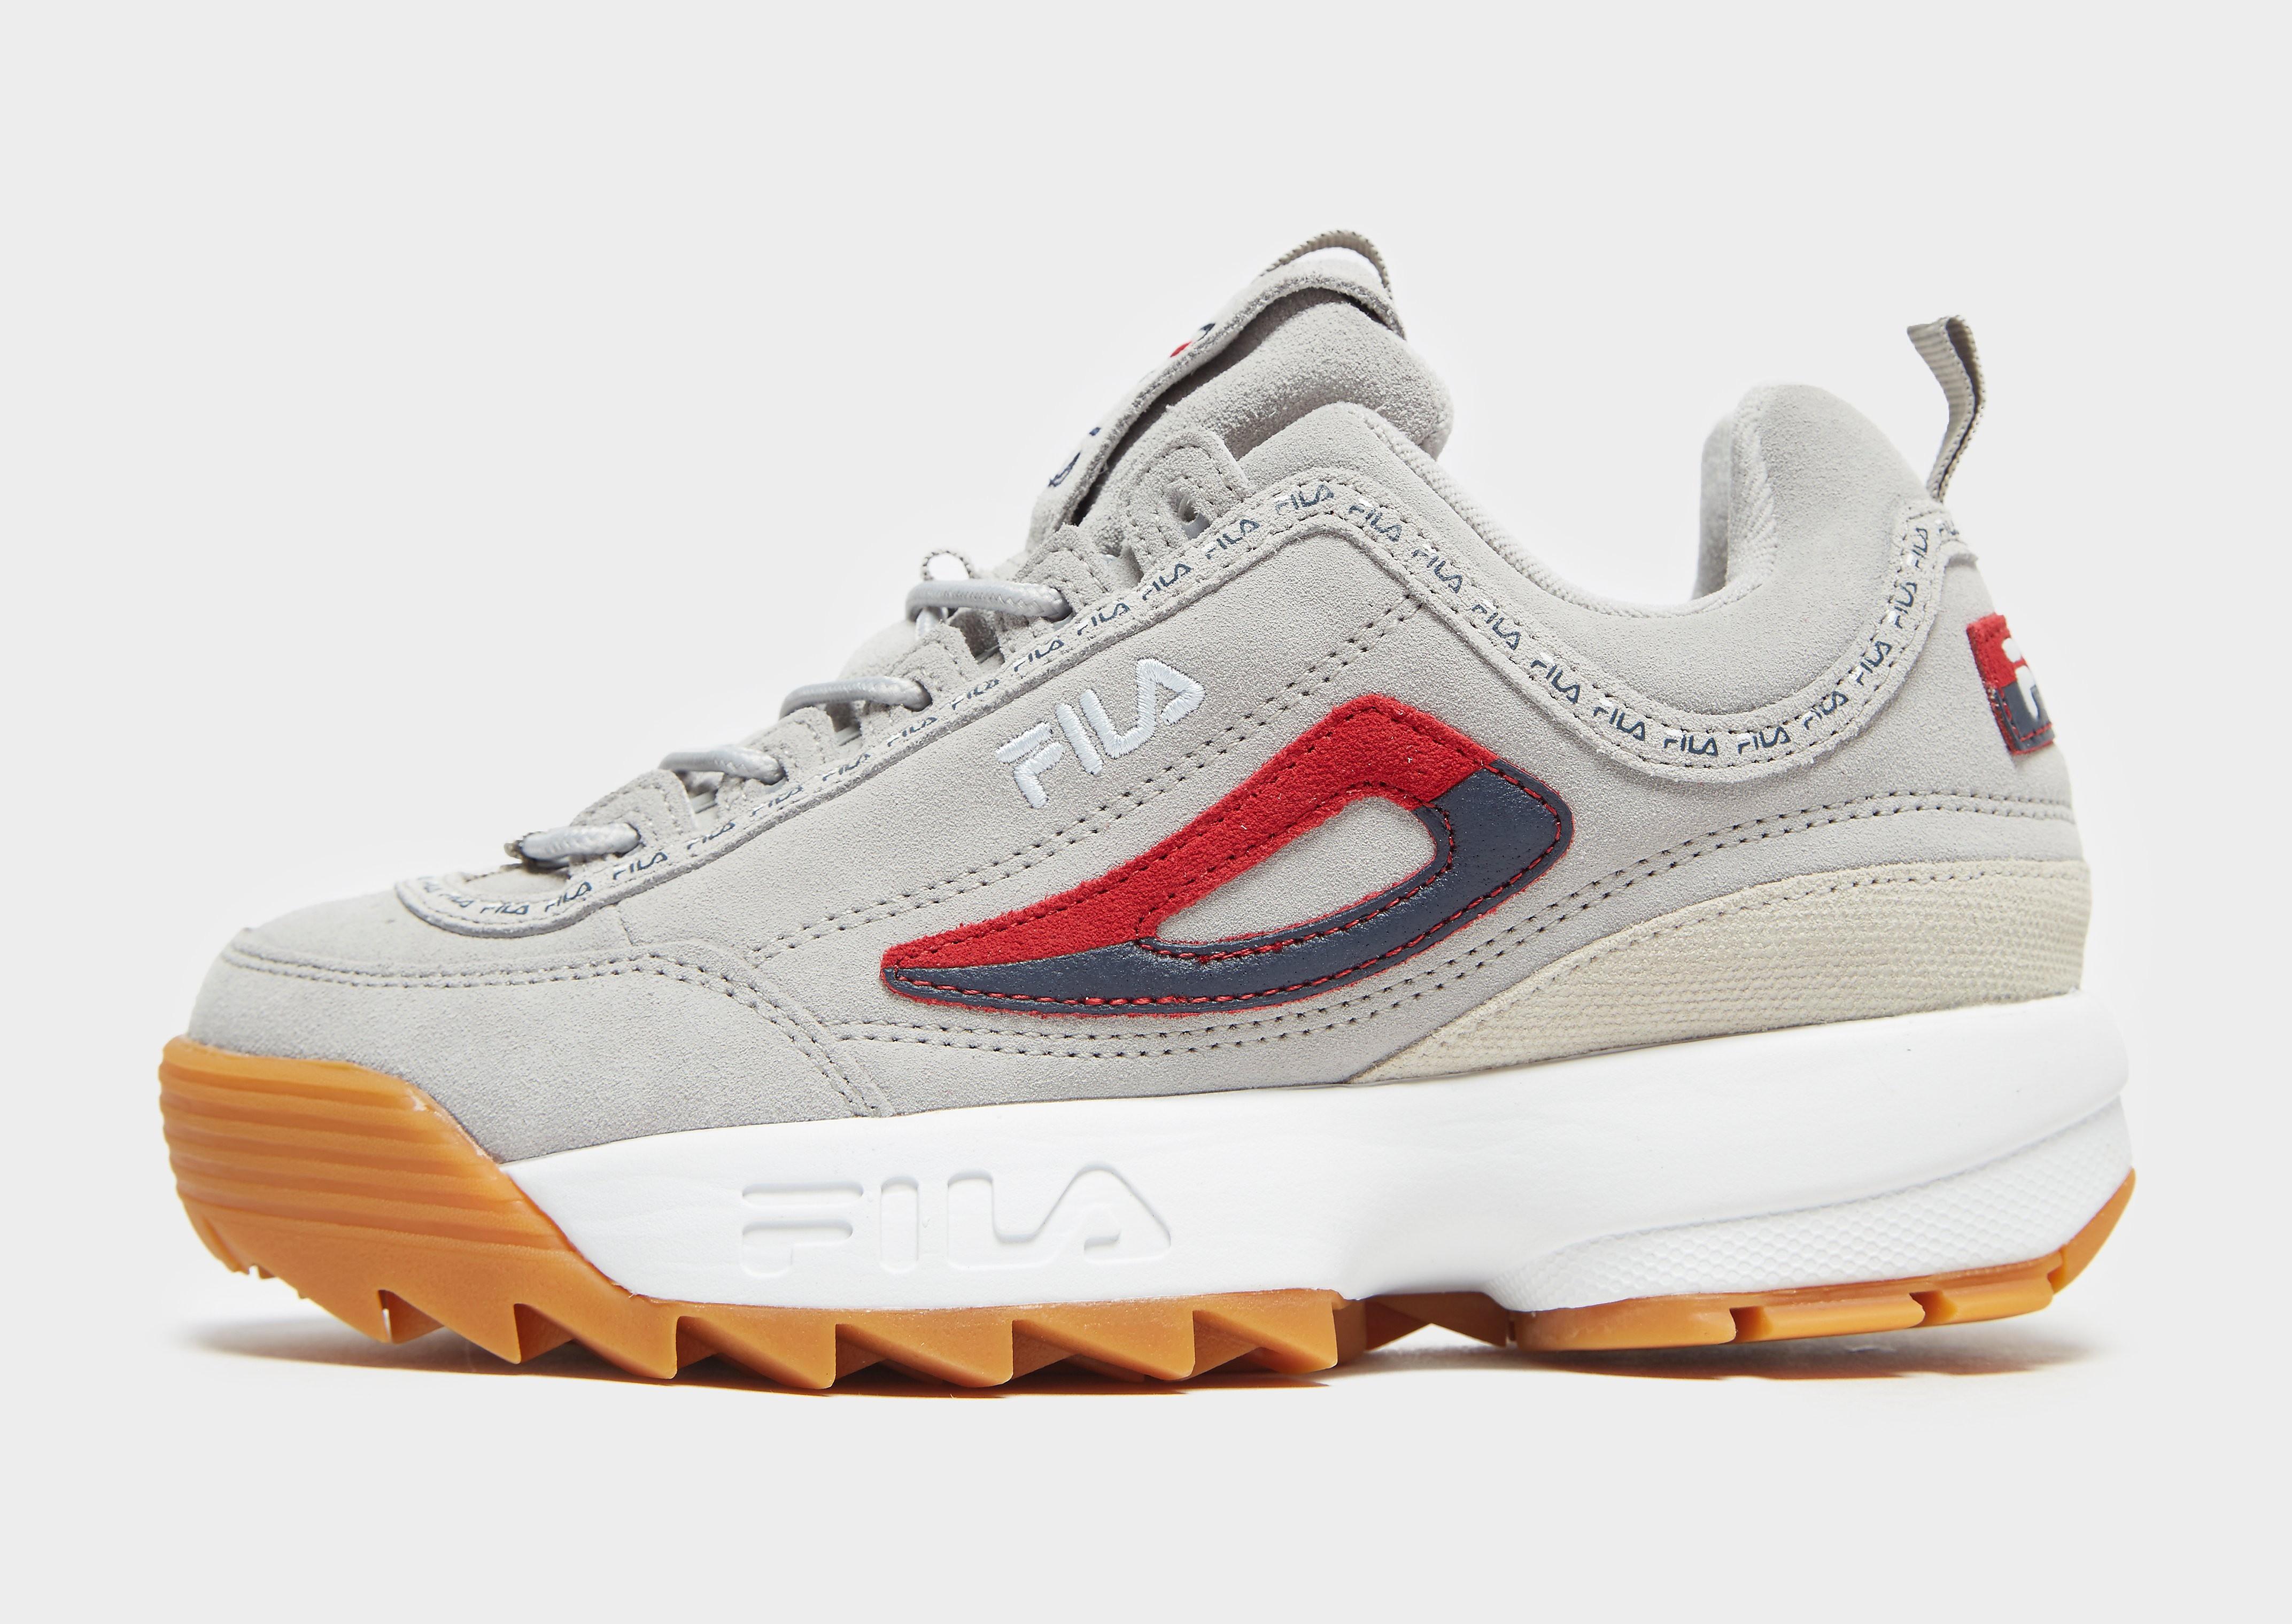 Sneaker Fila Fila Disruptor II Repeat Women's